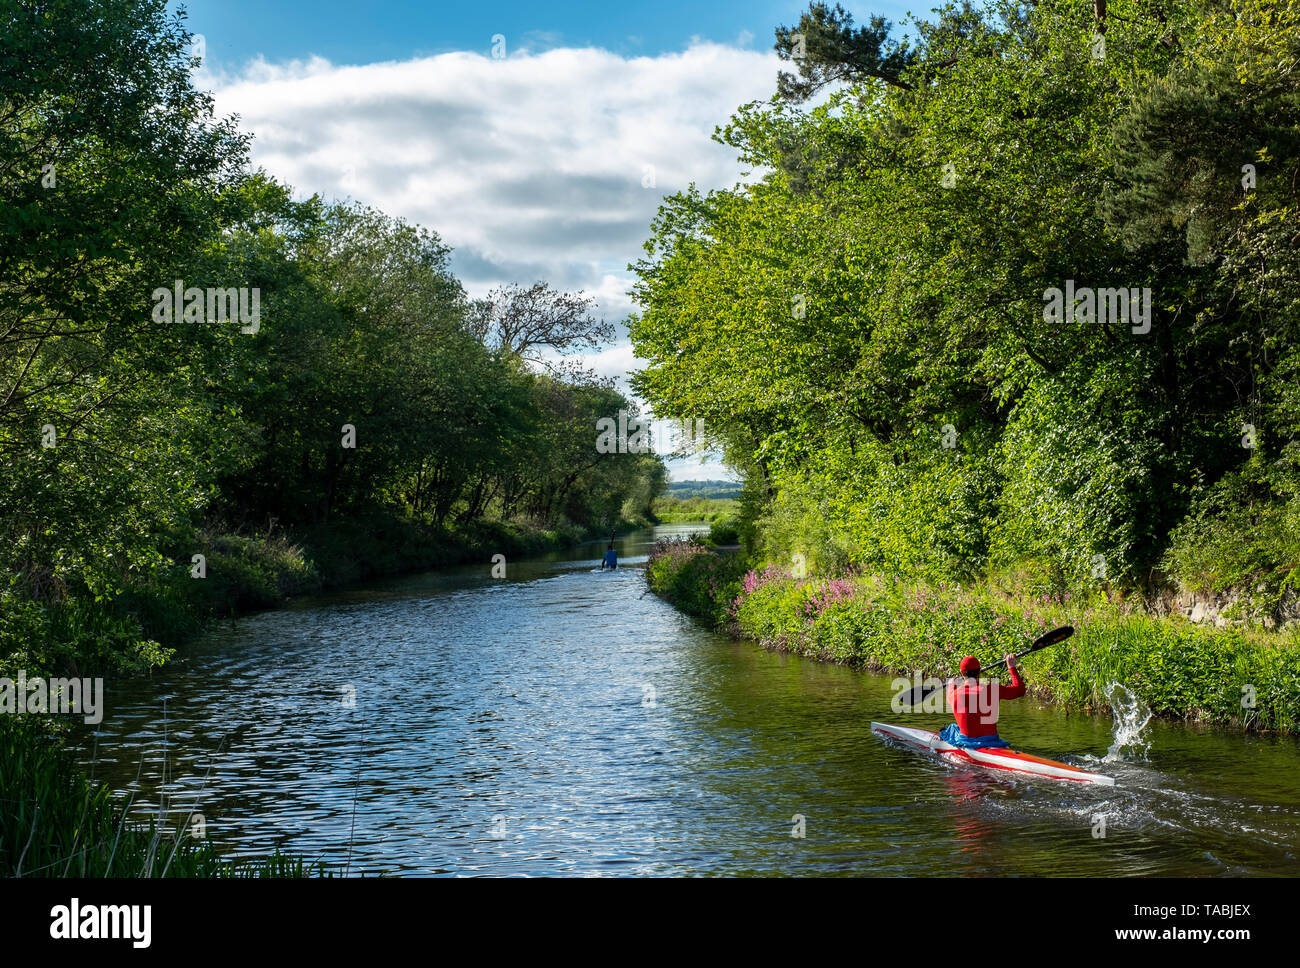 Canotaje en el Union Canal cerca del molino de Lins, Newbridge, West Lothian. Imagen De Stock